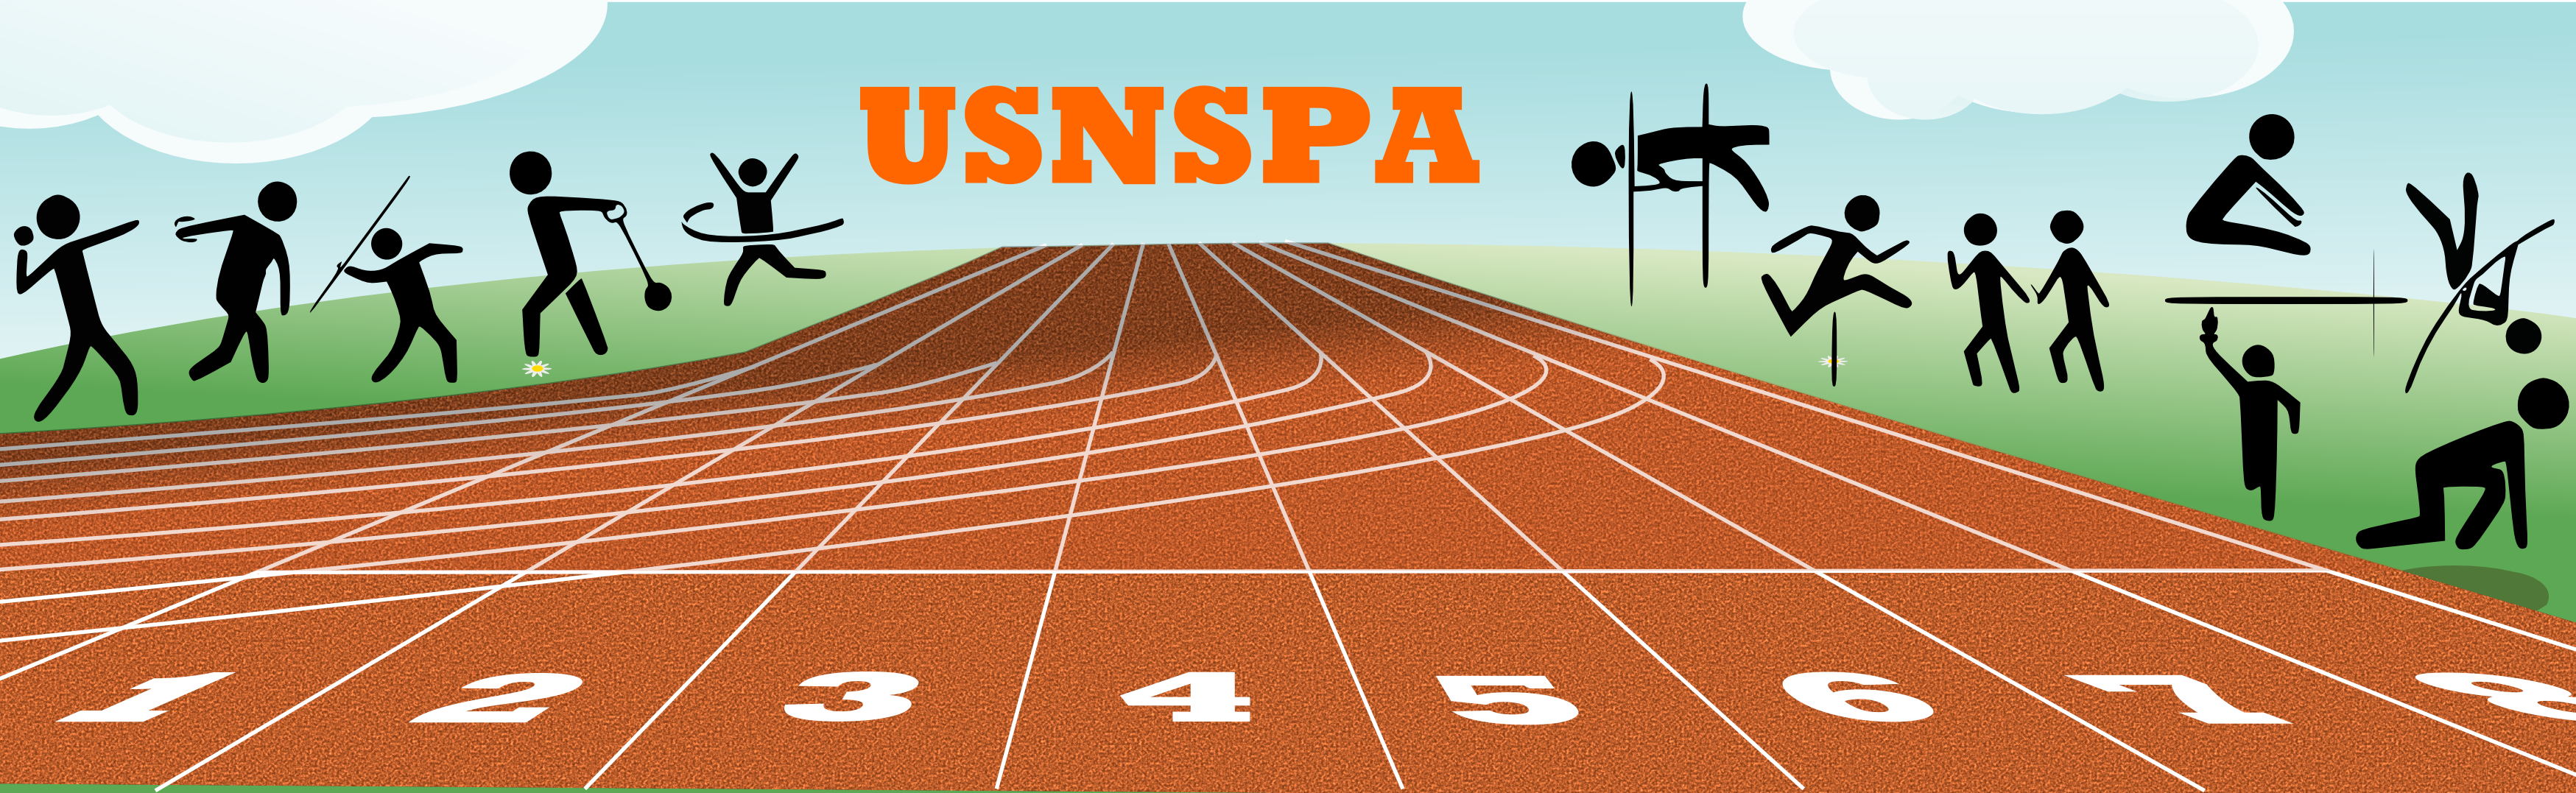 USNSPA athlétisme logo